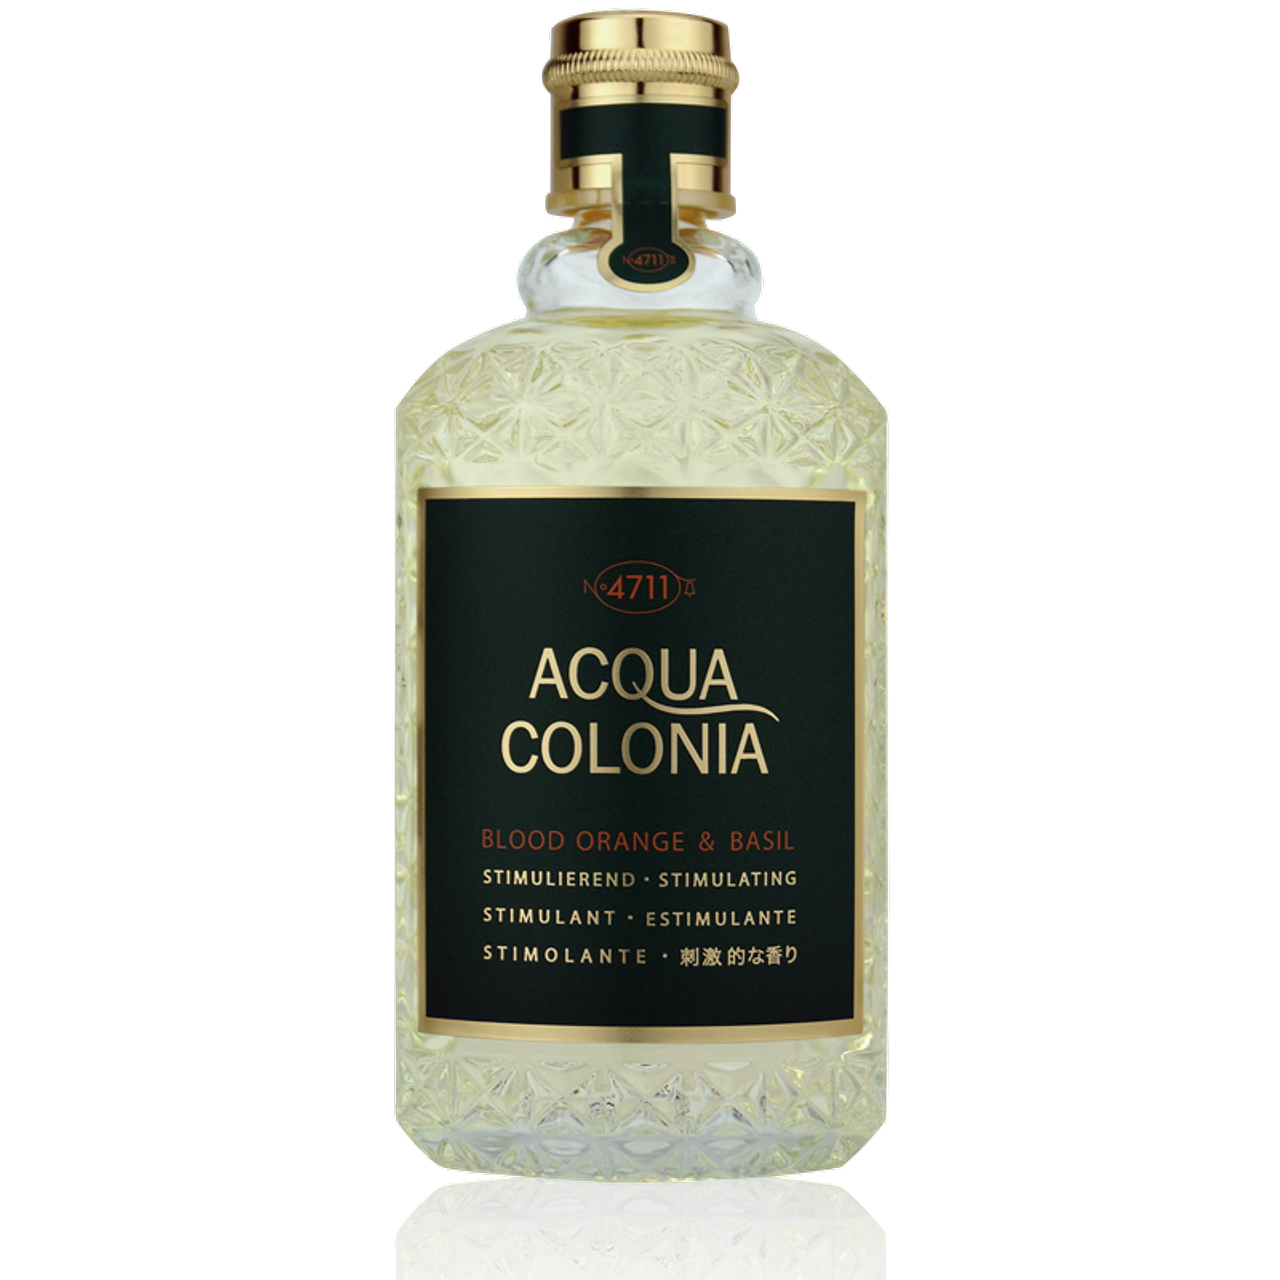 4711 Acqua Colonia Blood Orange & Basil EdC 170ml